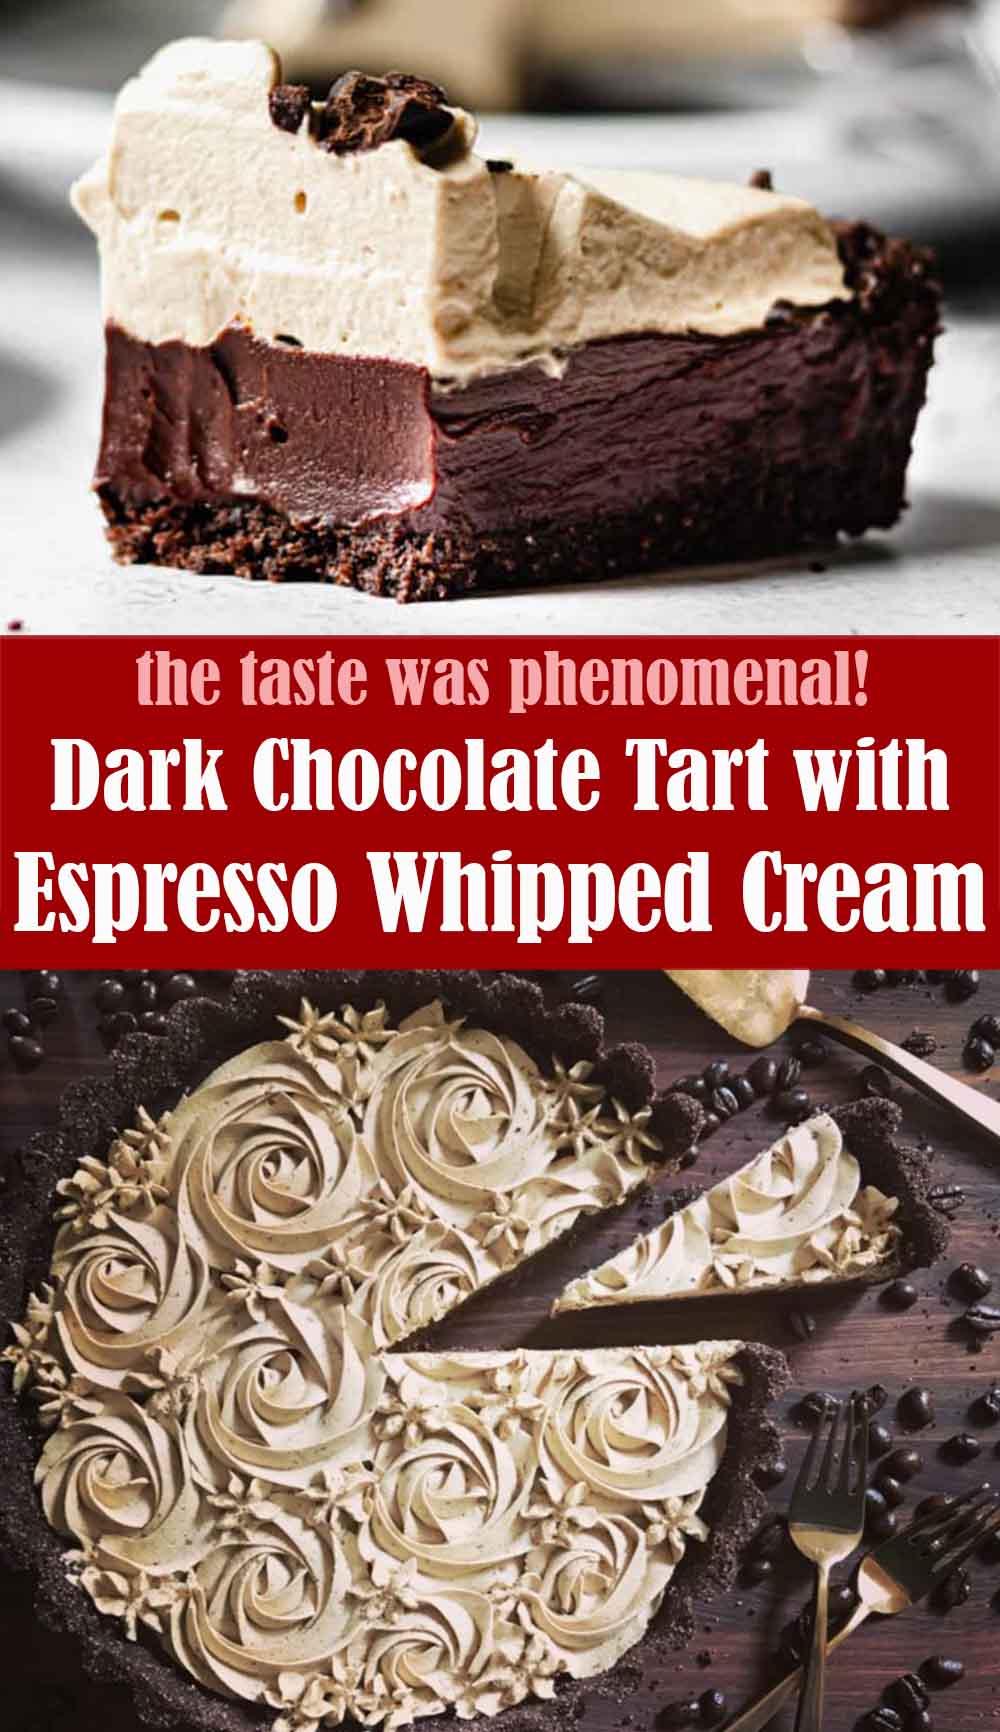 Dark Chocolate Tart with Espresso Whipped Cream